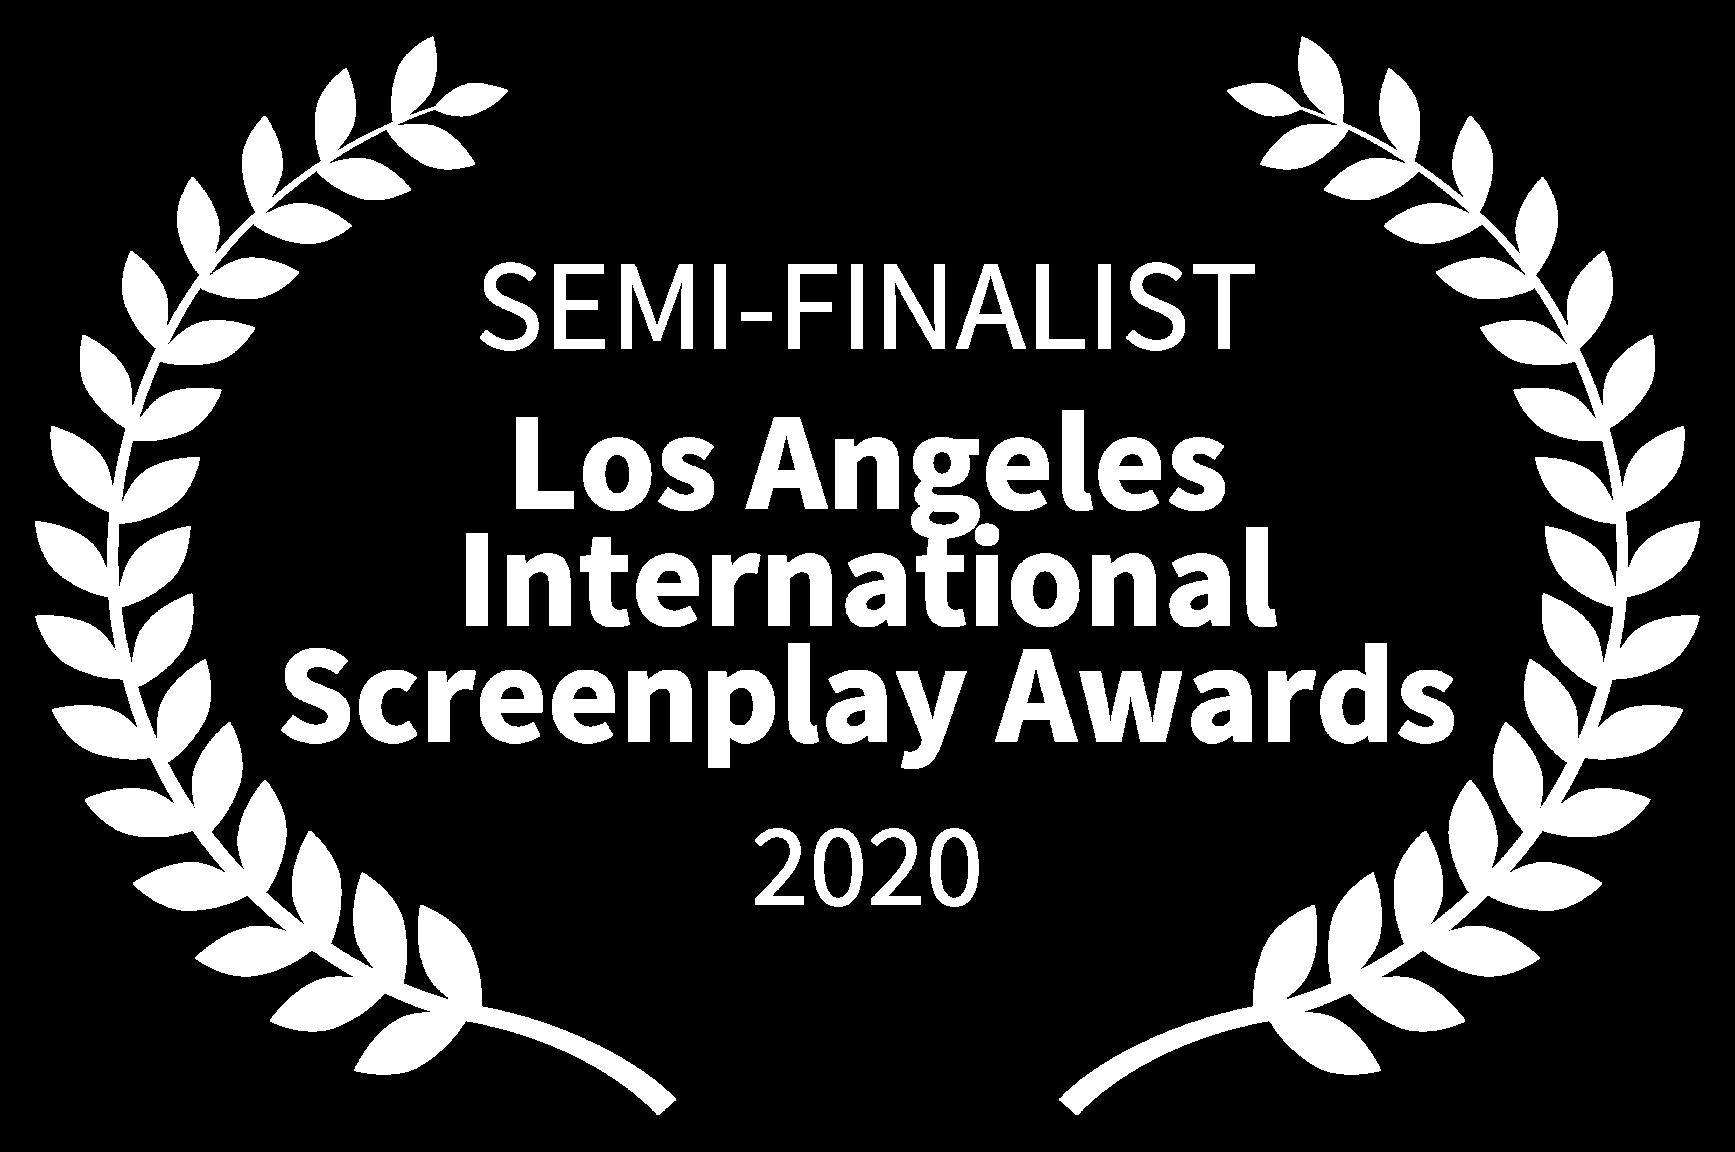 SEMI-FINALIST - Los Angeles International Screenplay Awards - 2020_White